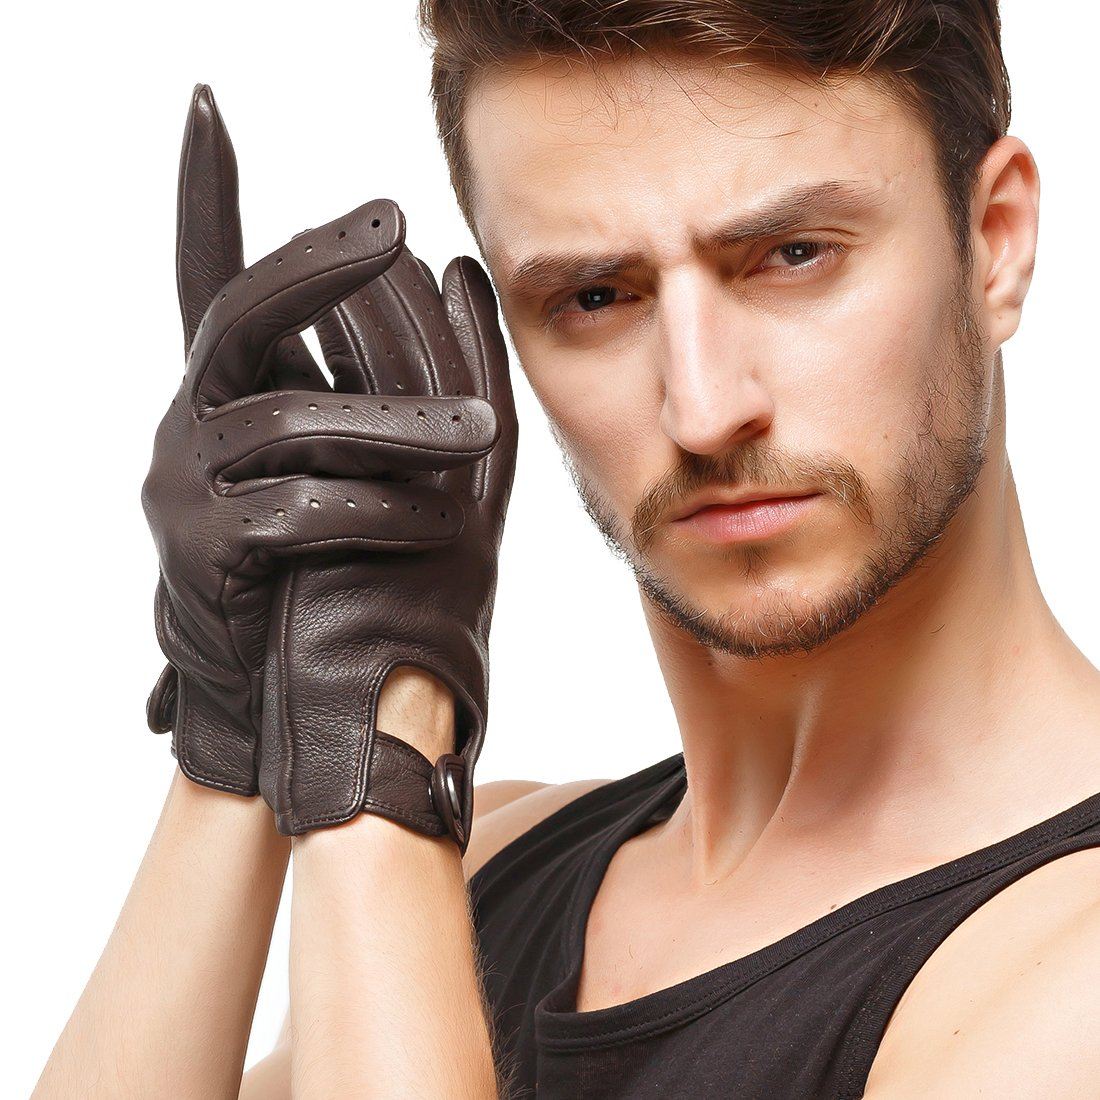 Nappaglo Herren Hirschleder Touchscreen Handschuhe Lederhandschuhe für fahren Motorrad Radfahren Ungefüttert Handschuhe DCH021